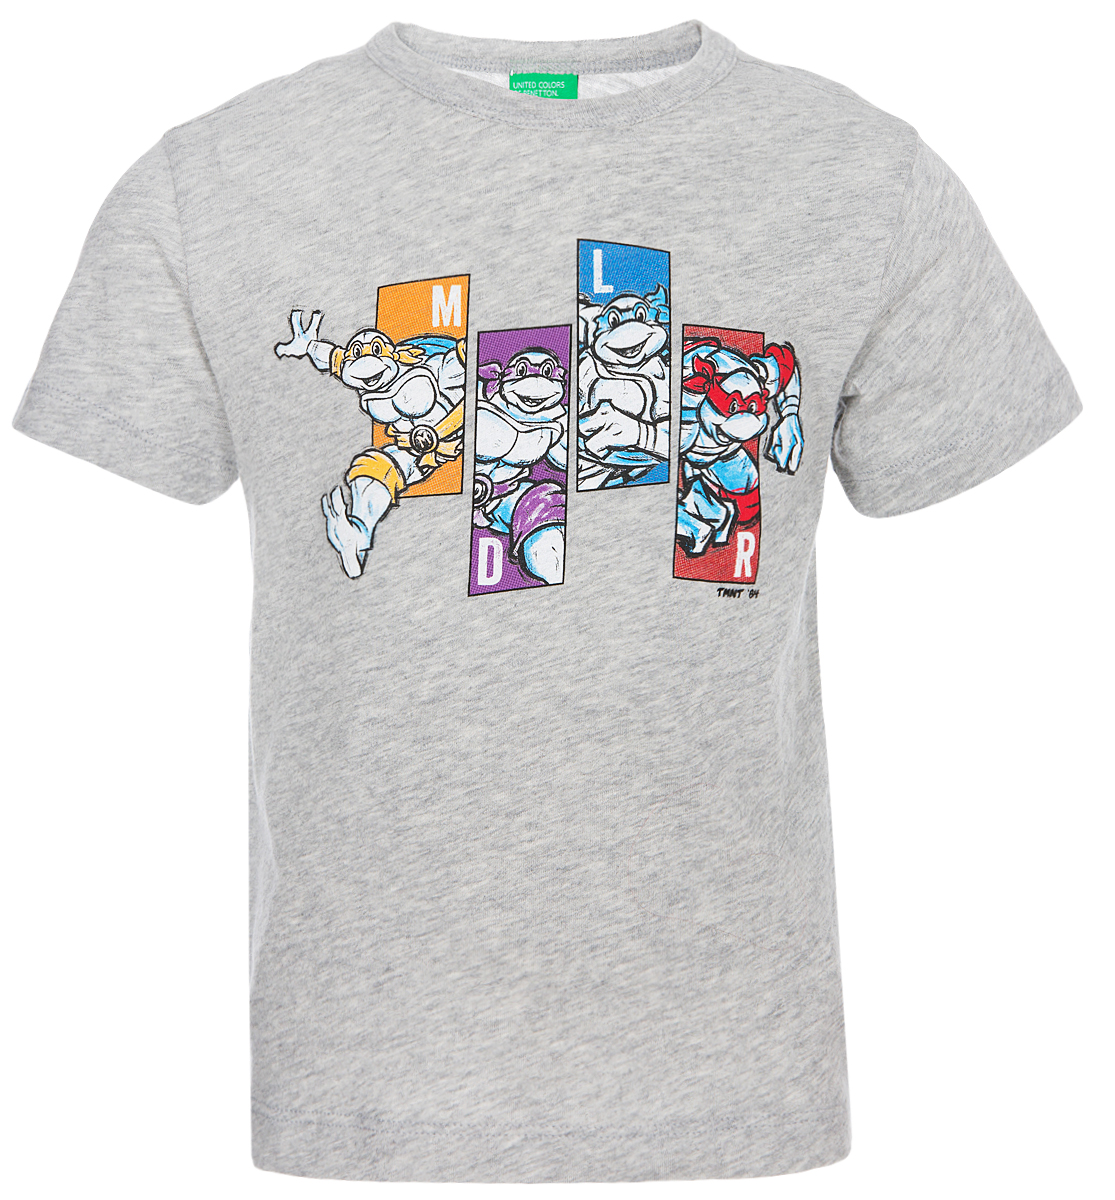 Футболка для мальчика United Colors of Benetton, цвет: серый. 3Z01C18PP_501. Размер 100 пижама для мальчика united colors of benetton цвет серый 3j68z11ls 501 размер 100